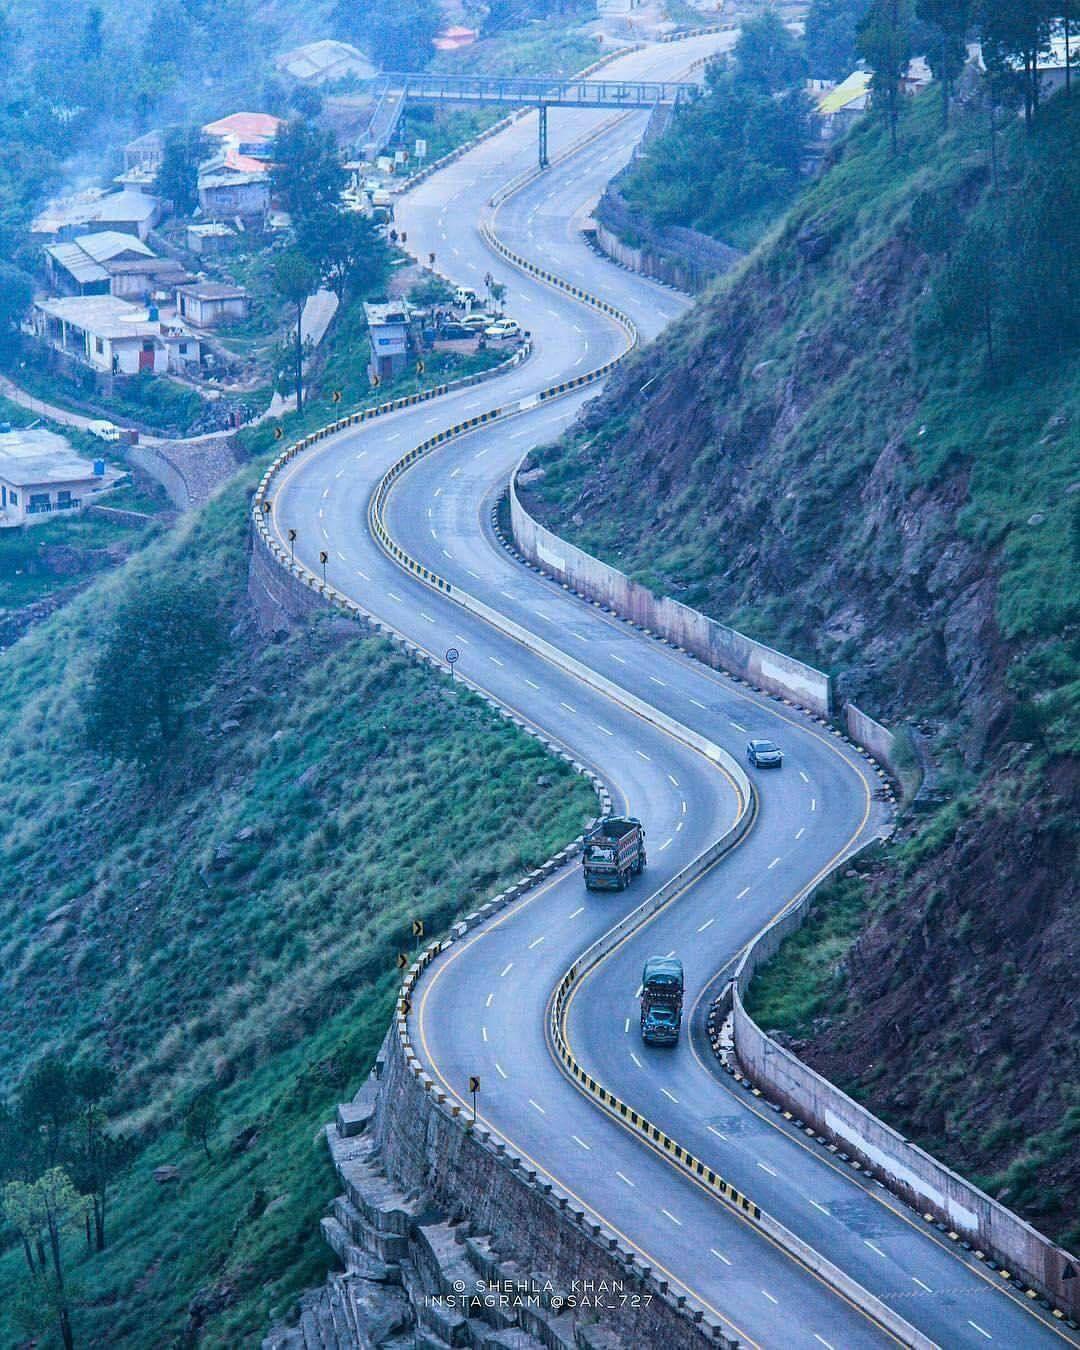 Islamabad Roads: Winding Road Near The Pakistani Capital